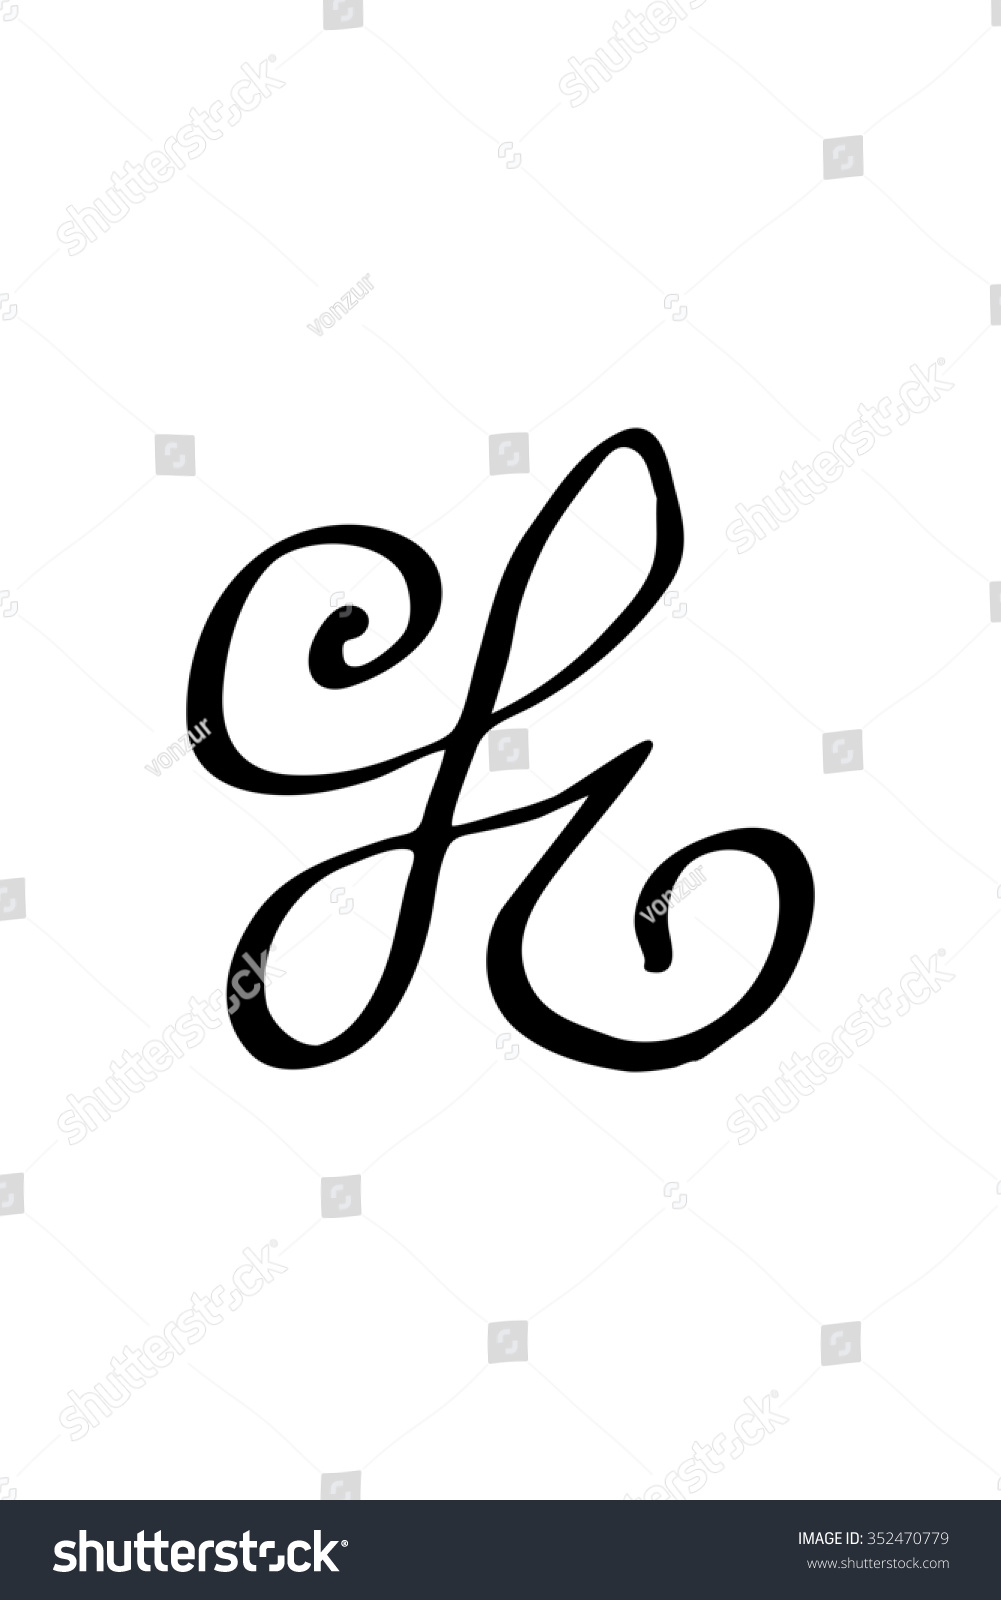 Zibu Angelic Symbols Used Connect Love Stock Vector Royalty Free